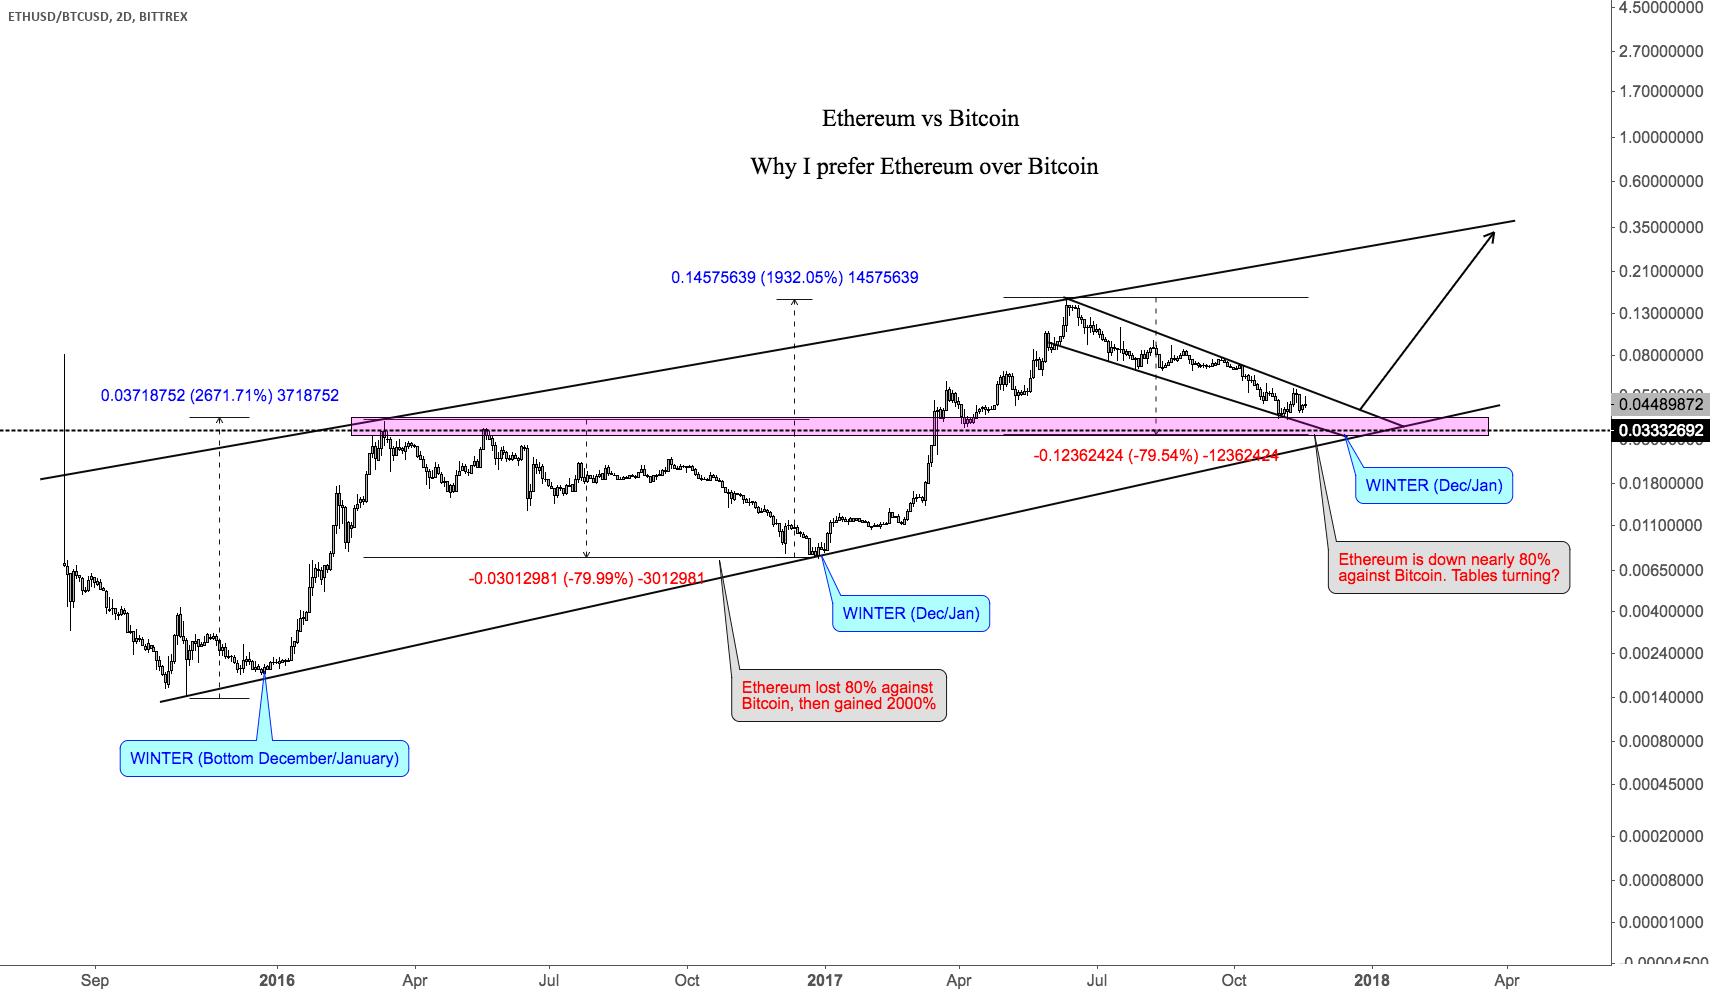 Winter is coming: Ethereum vs Bitcoin